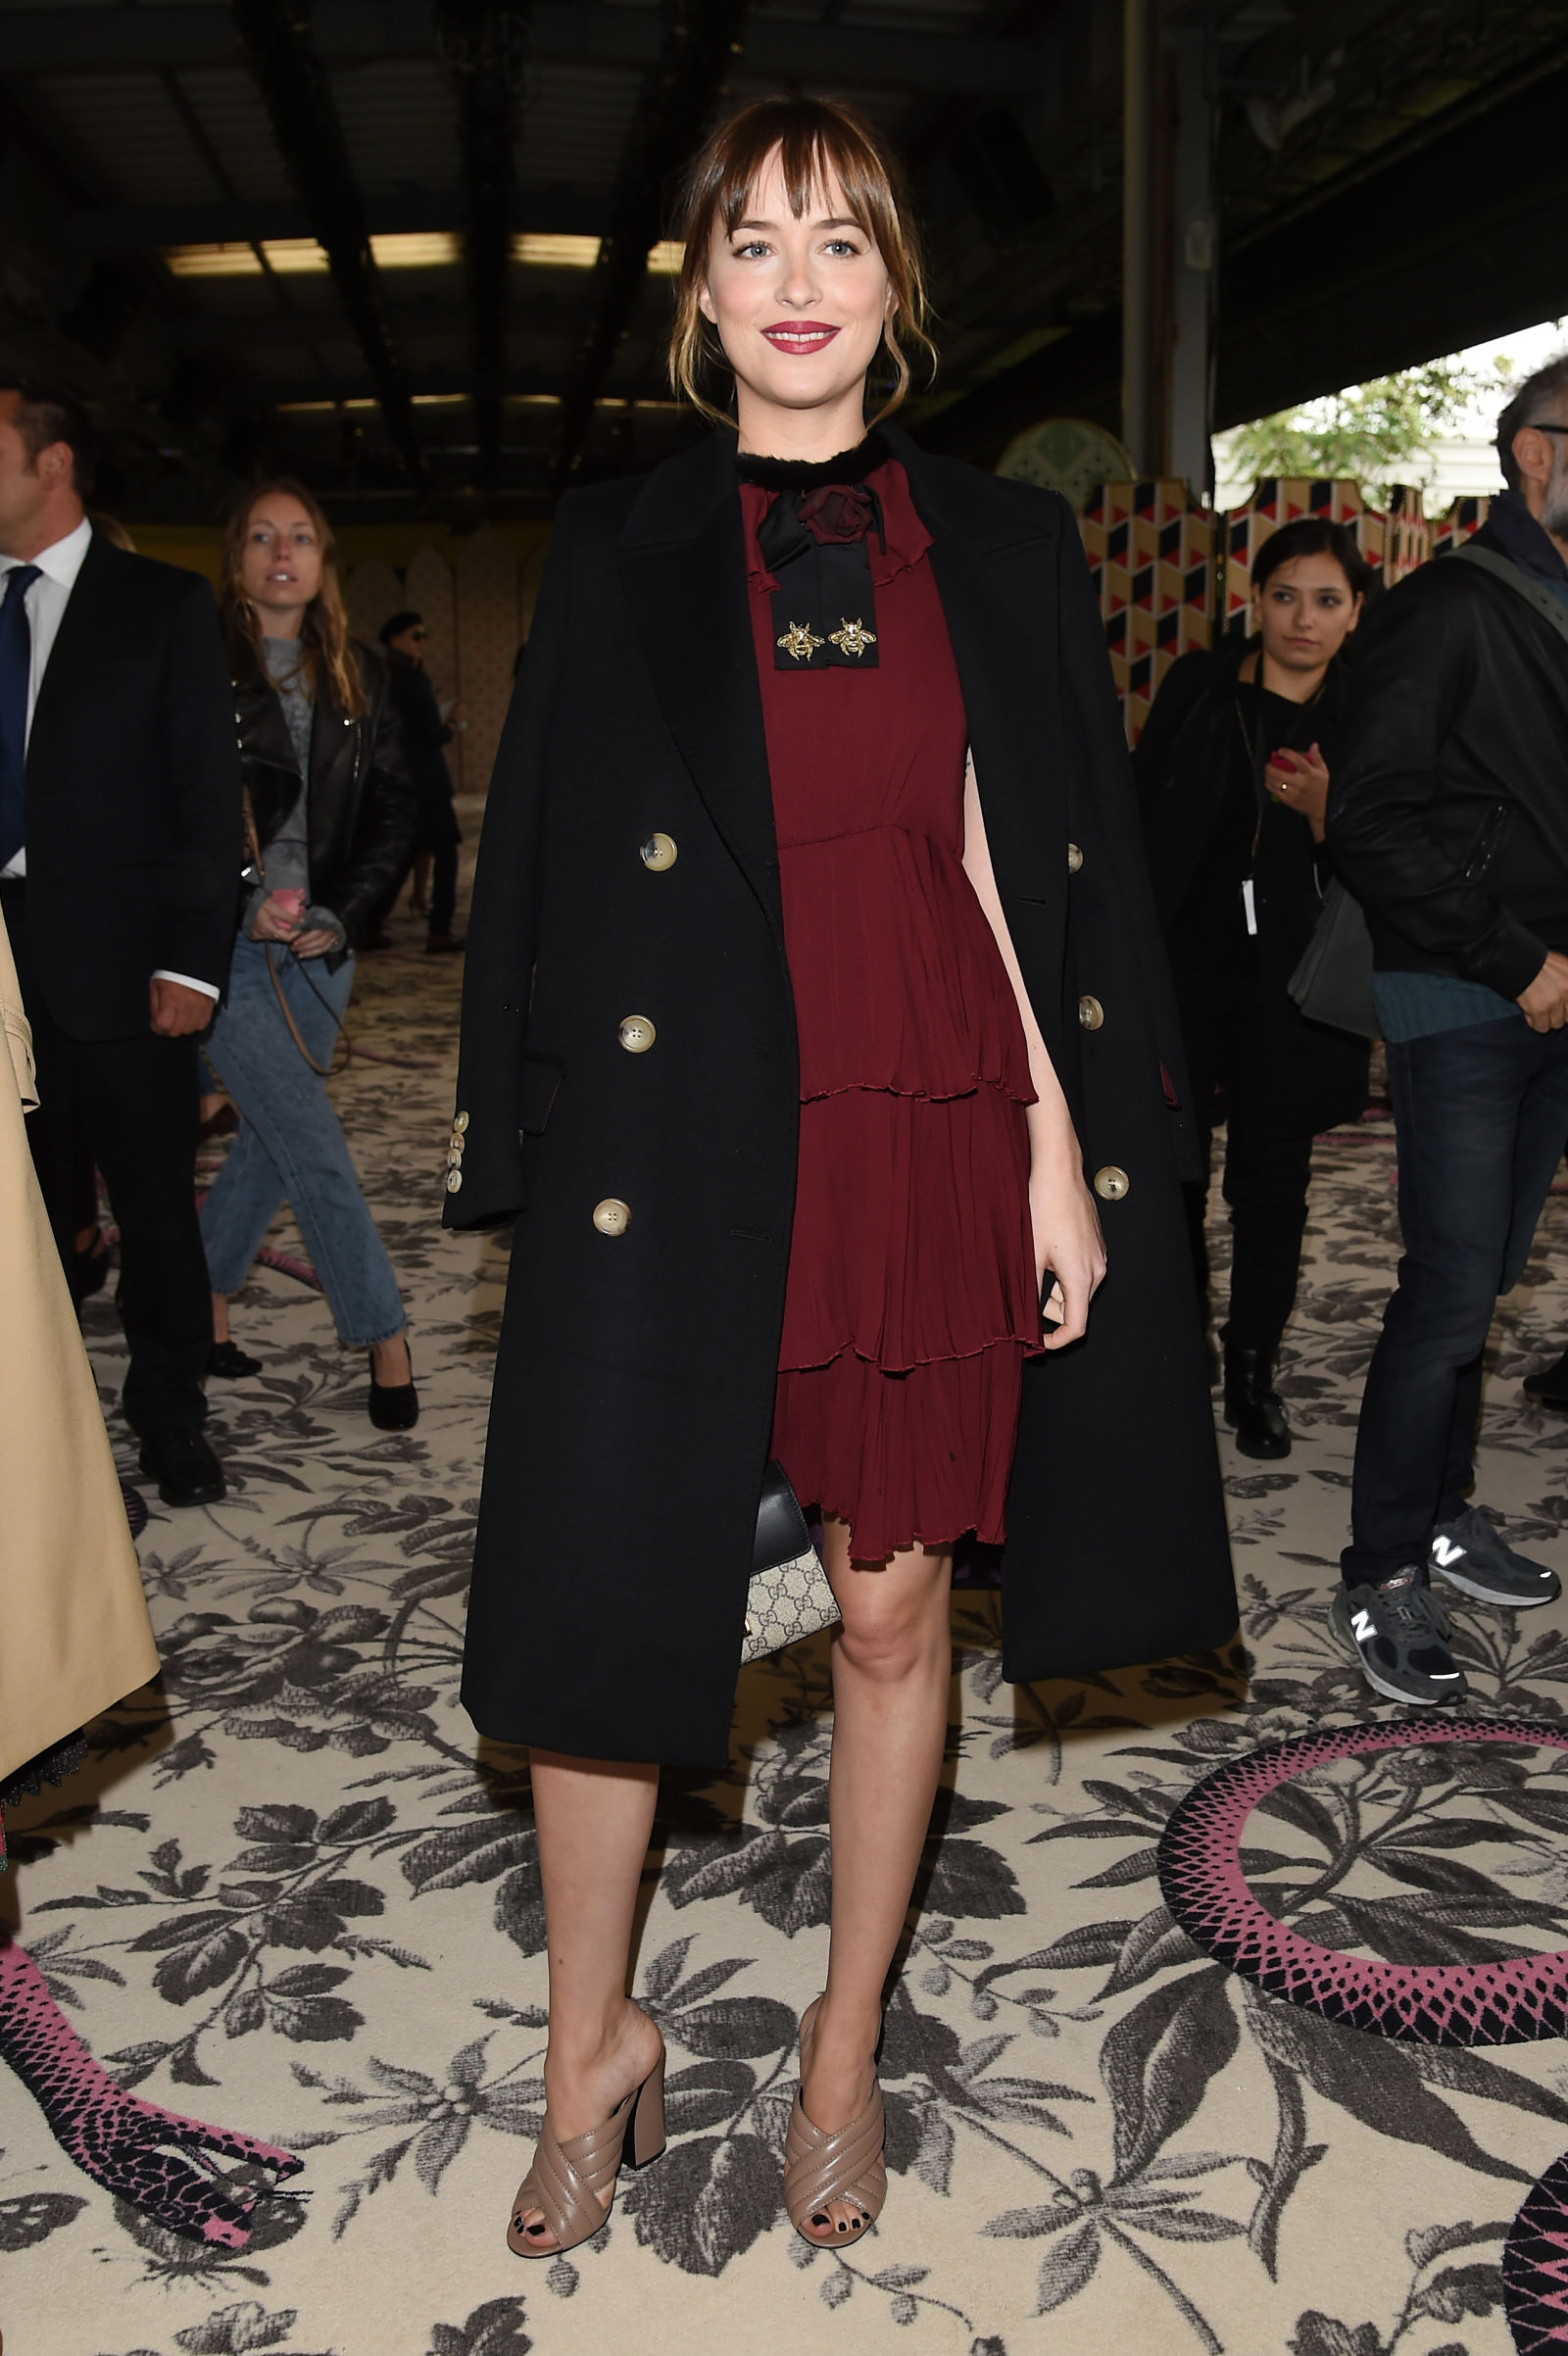 Dakota Johnson hairstyles 2016 at Gucci